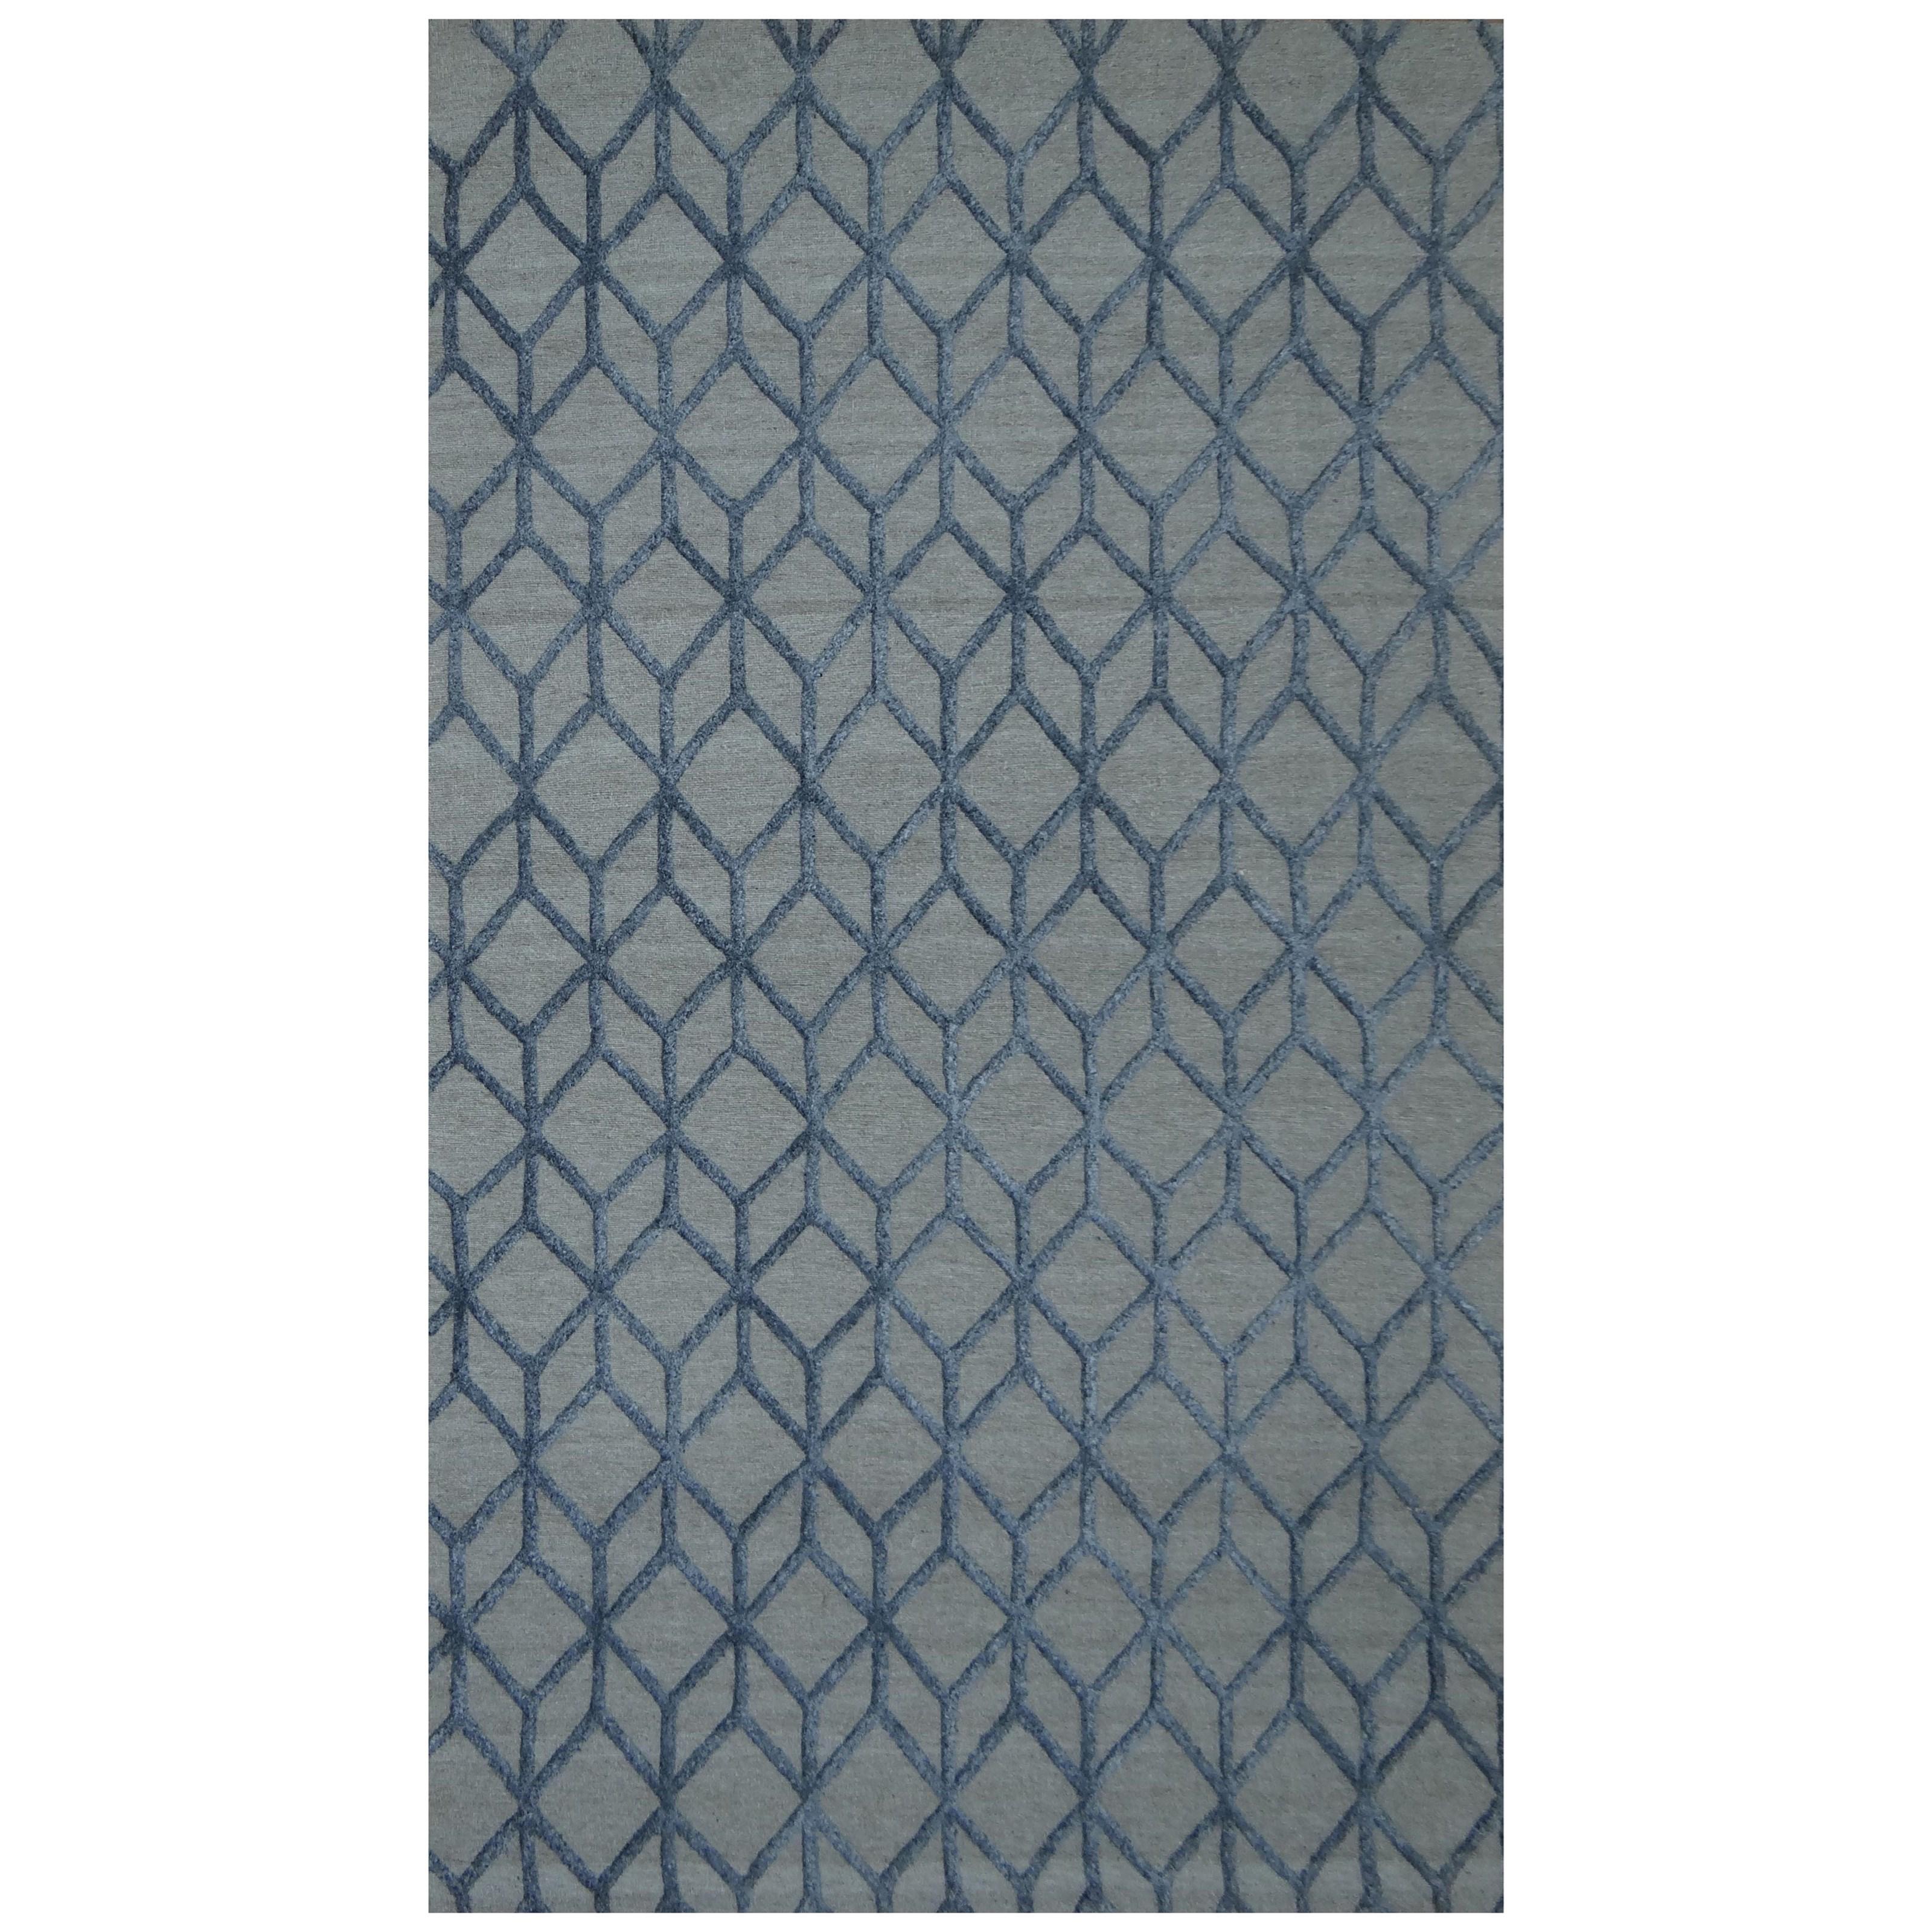 Moe S Home Collection Rugs Rhumba Rug 8x10 Cadet Grey